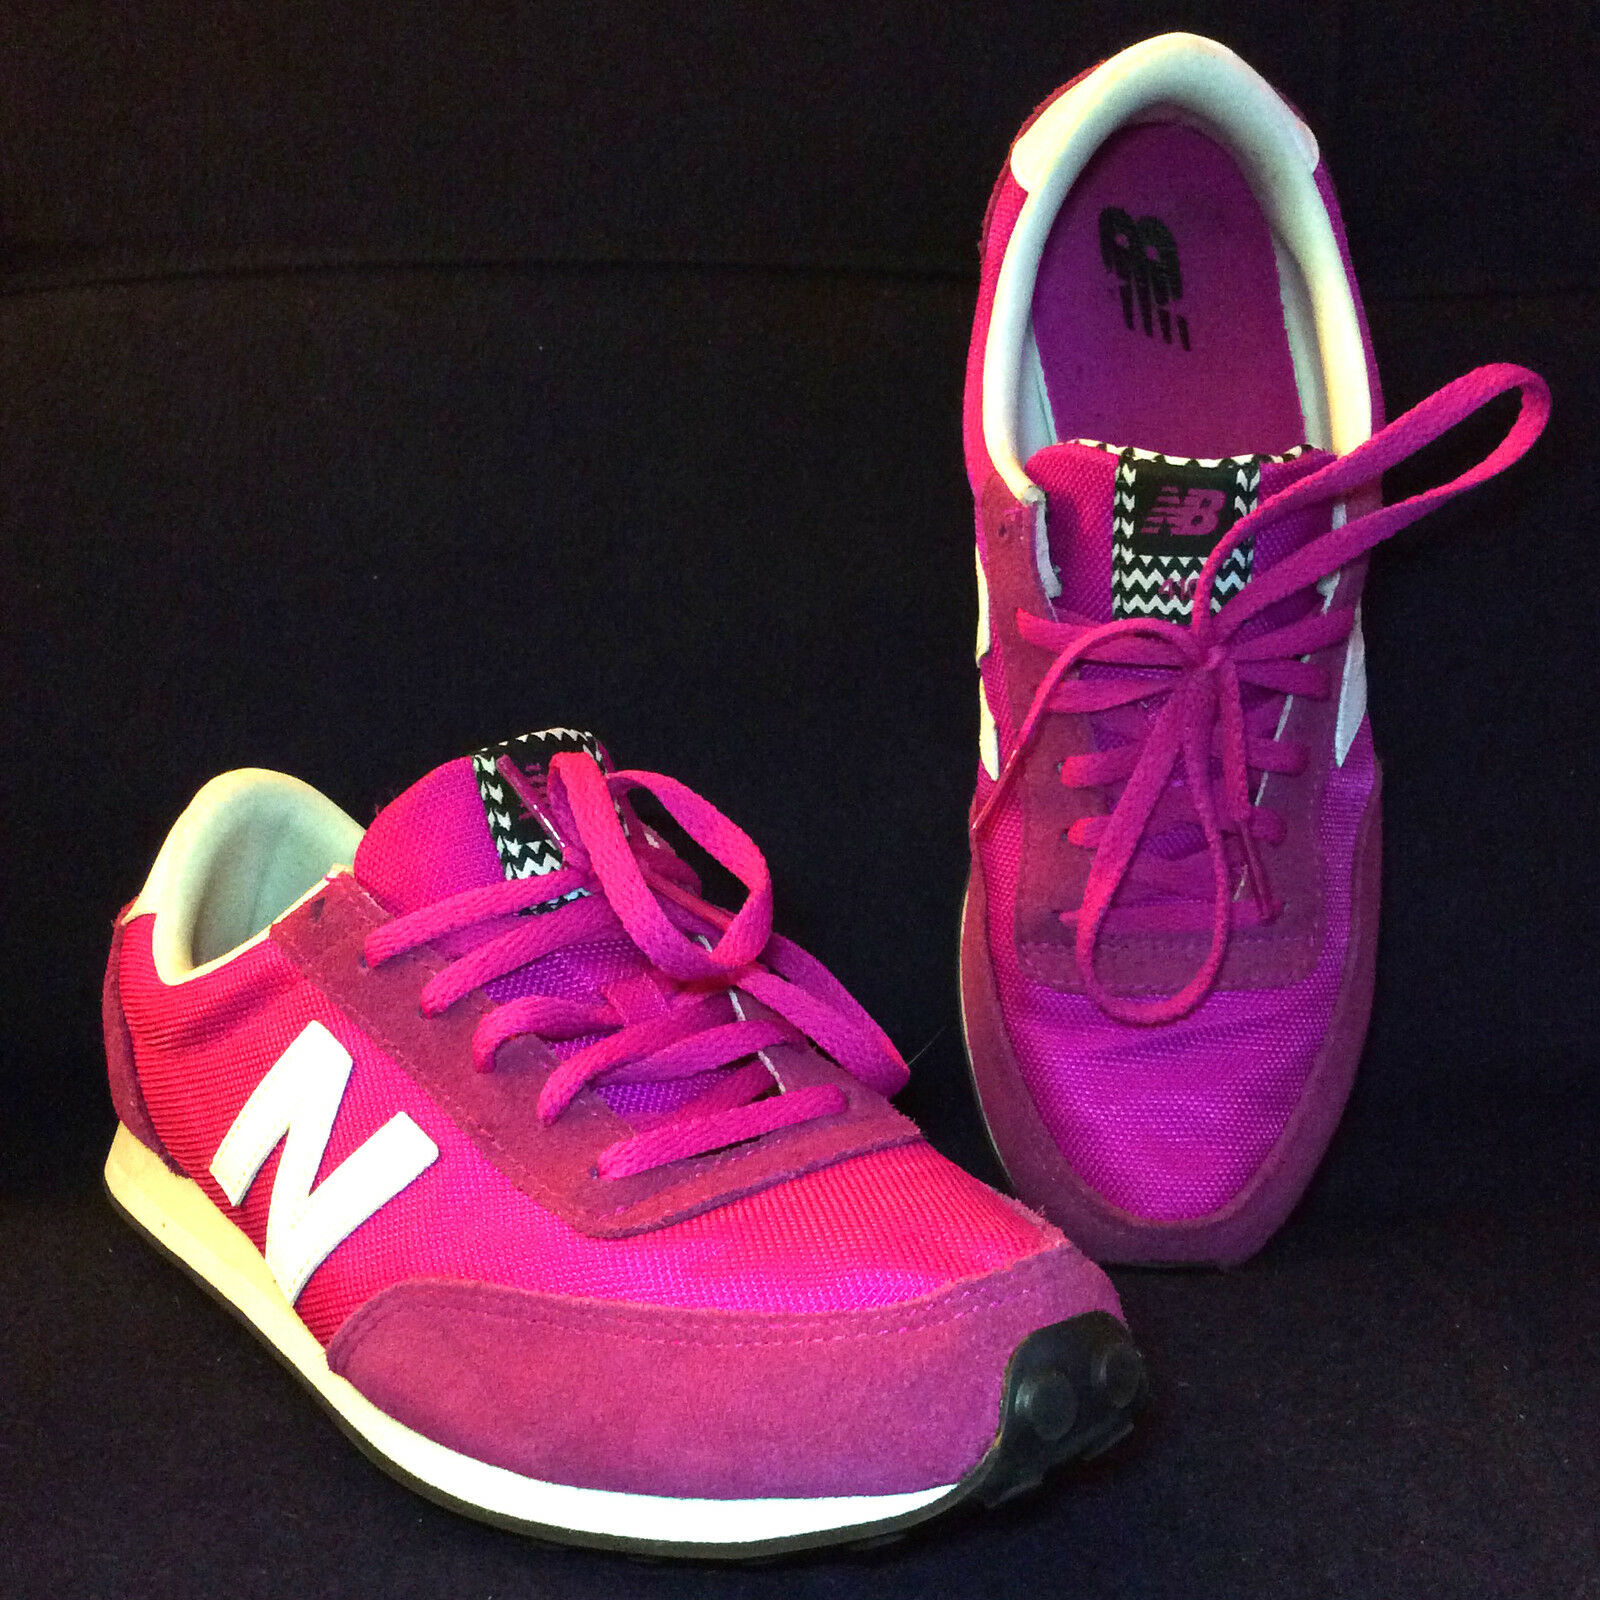 New Balance Turnschuhe Rosa Größe 10 Magenta Weiß Athletic Gym Running schuhe NICE